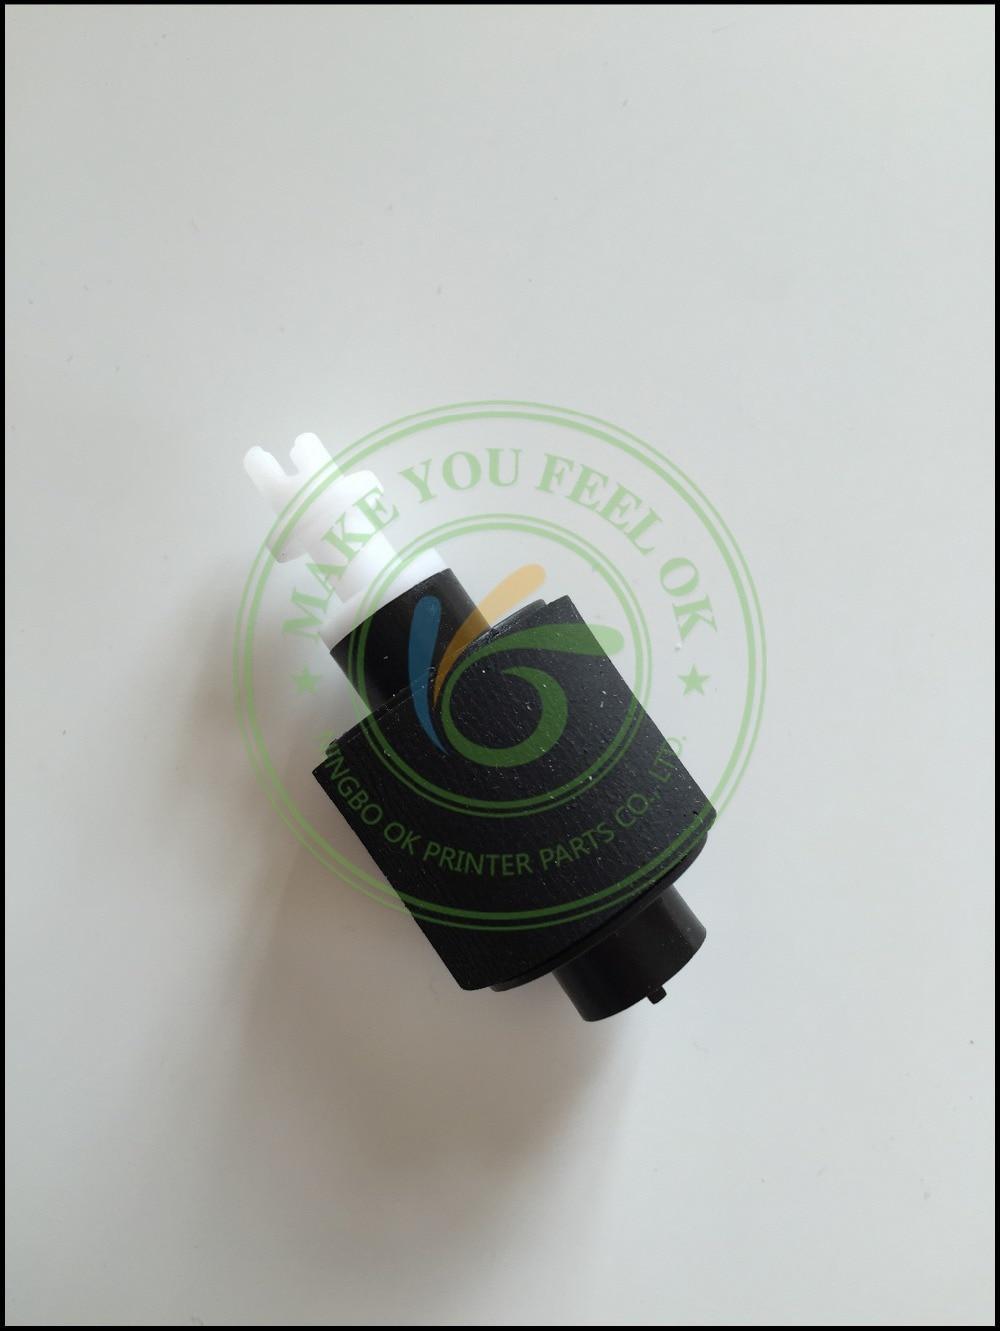 10X RL1-3167 RL1-1370-000 Pickup Roller for HP P3005 P3005D P3005DN P3005N M3027